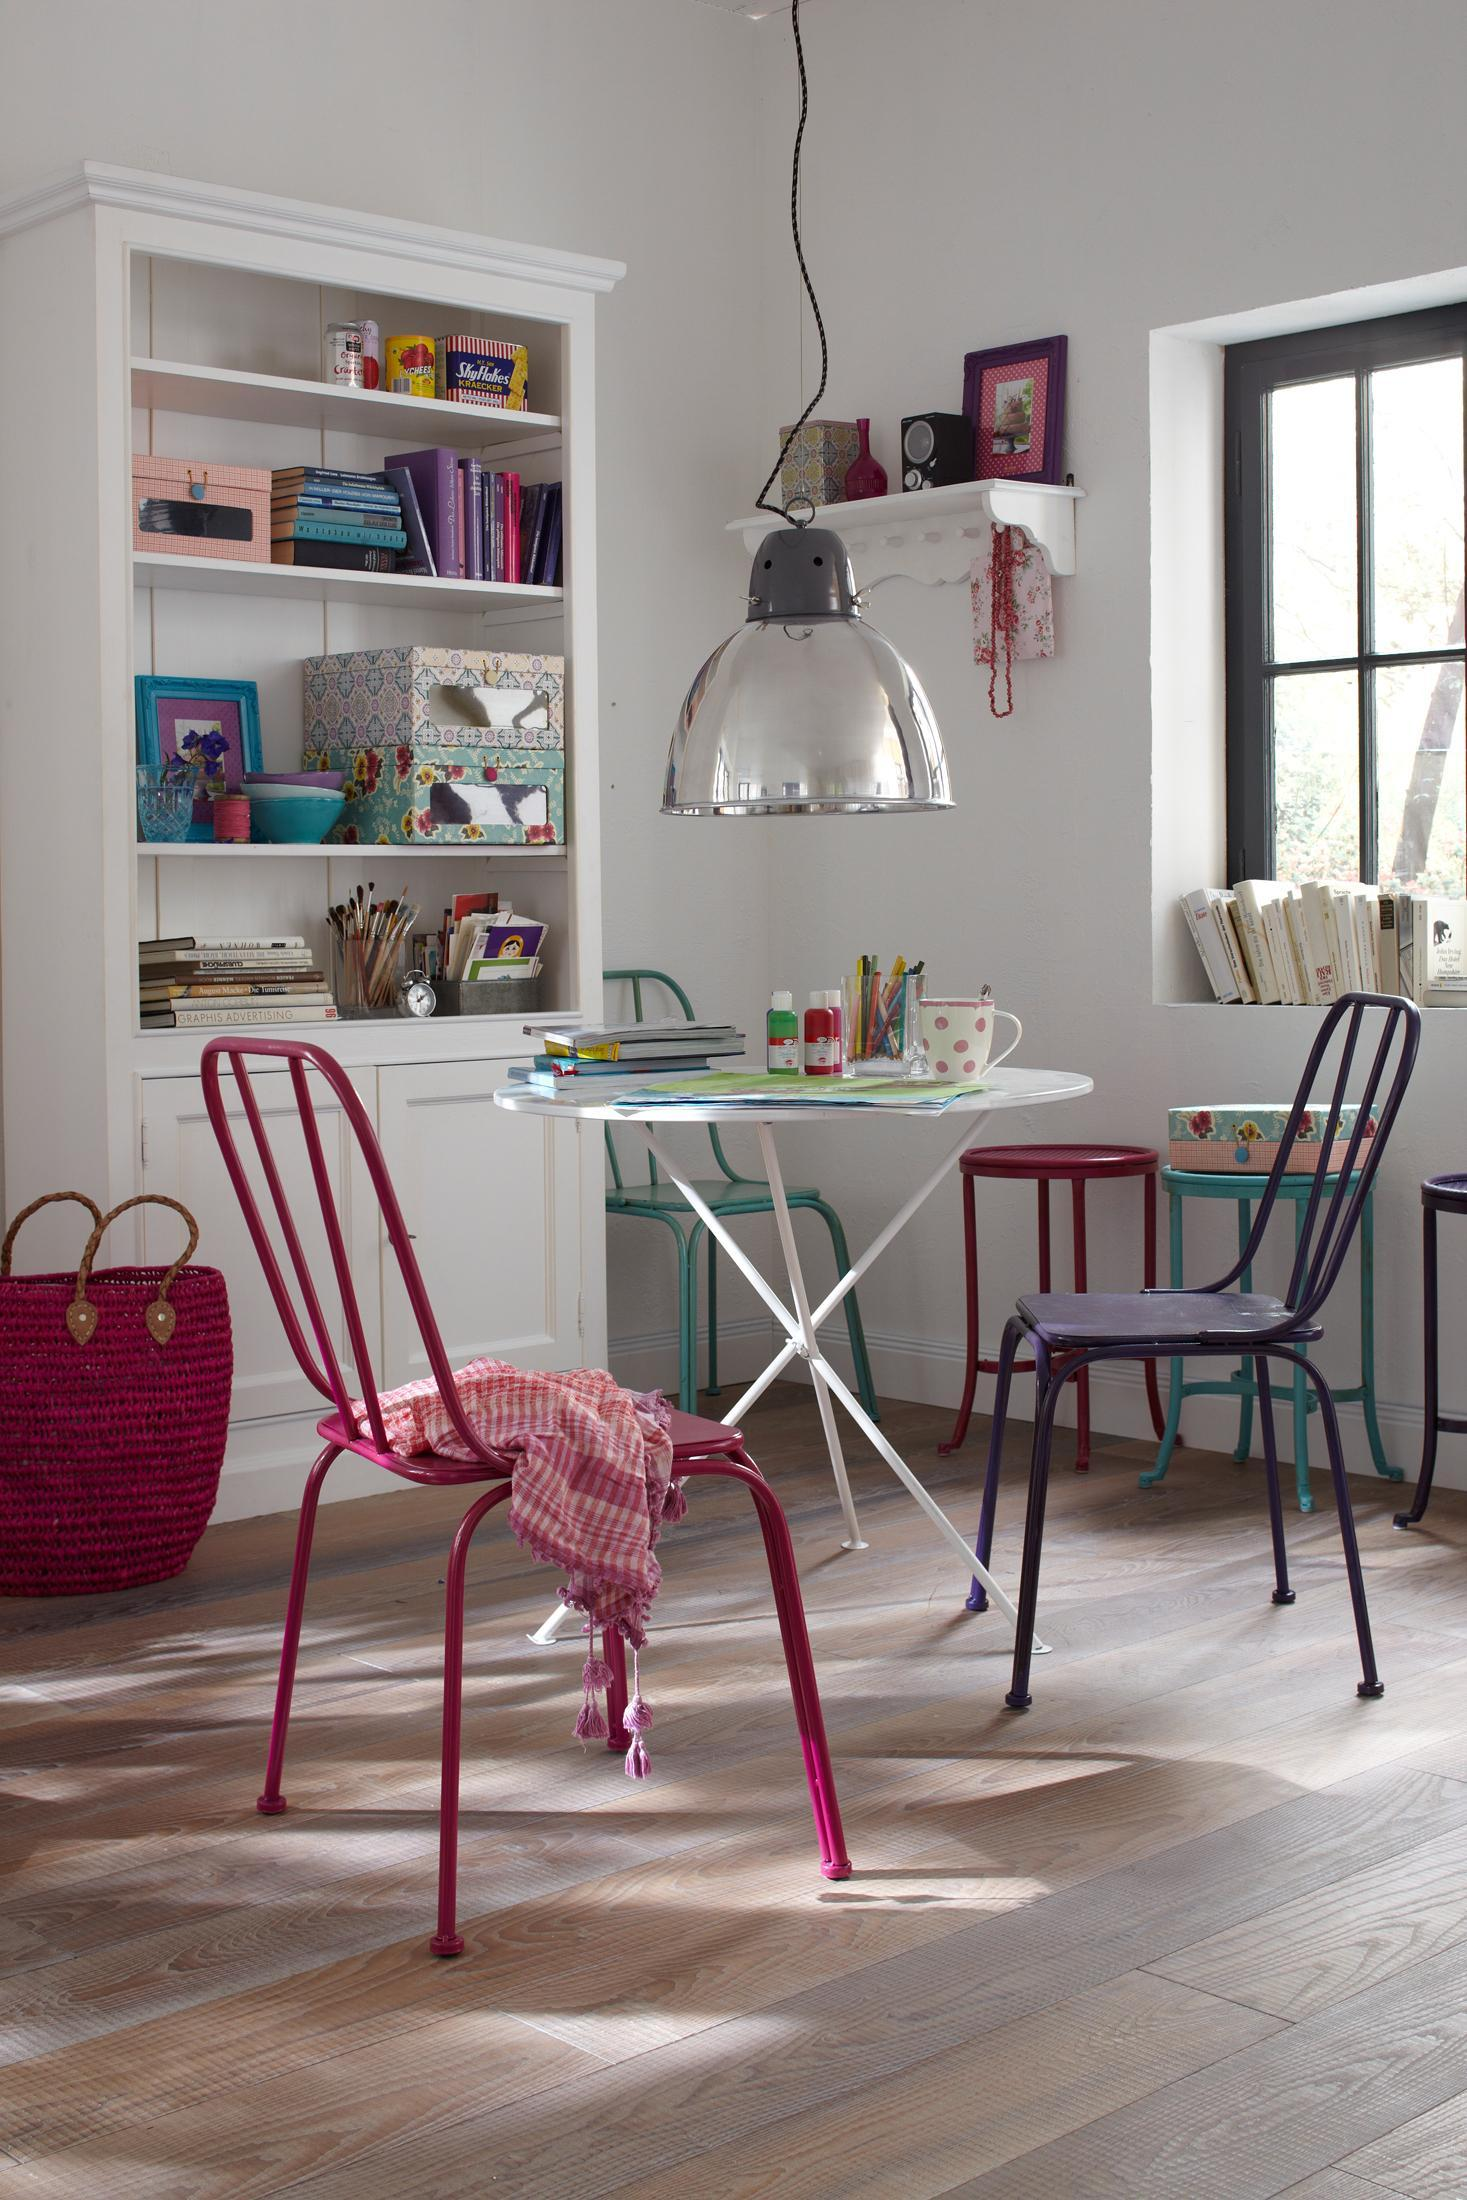 Car Möbel Stühle